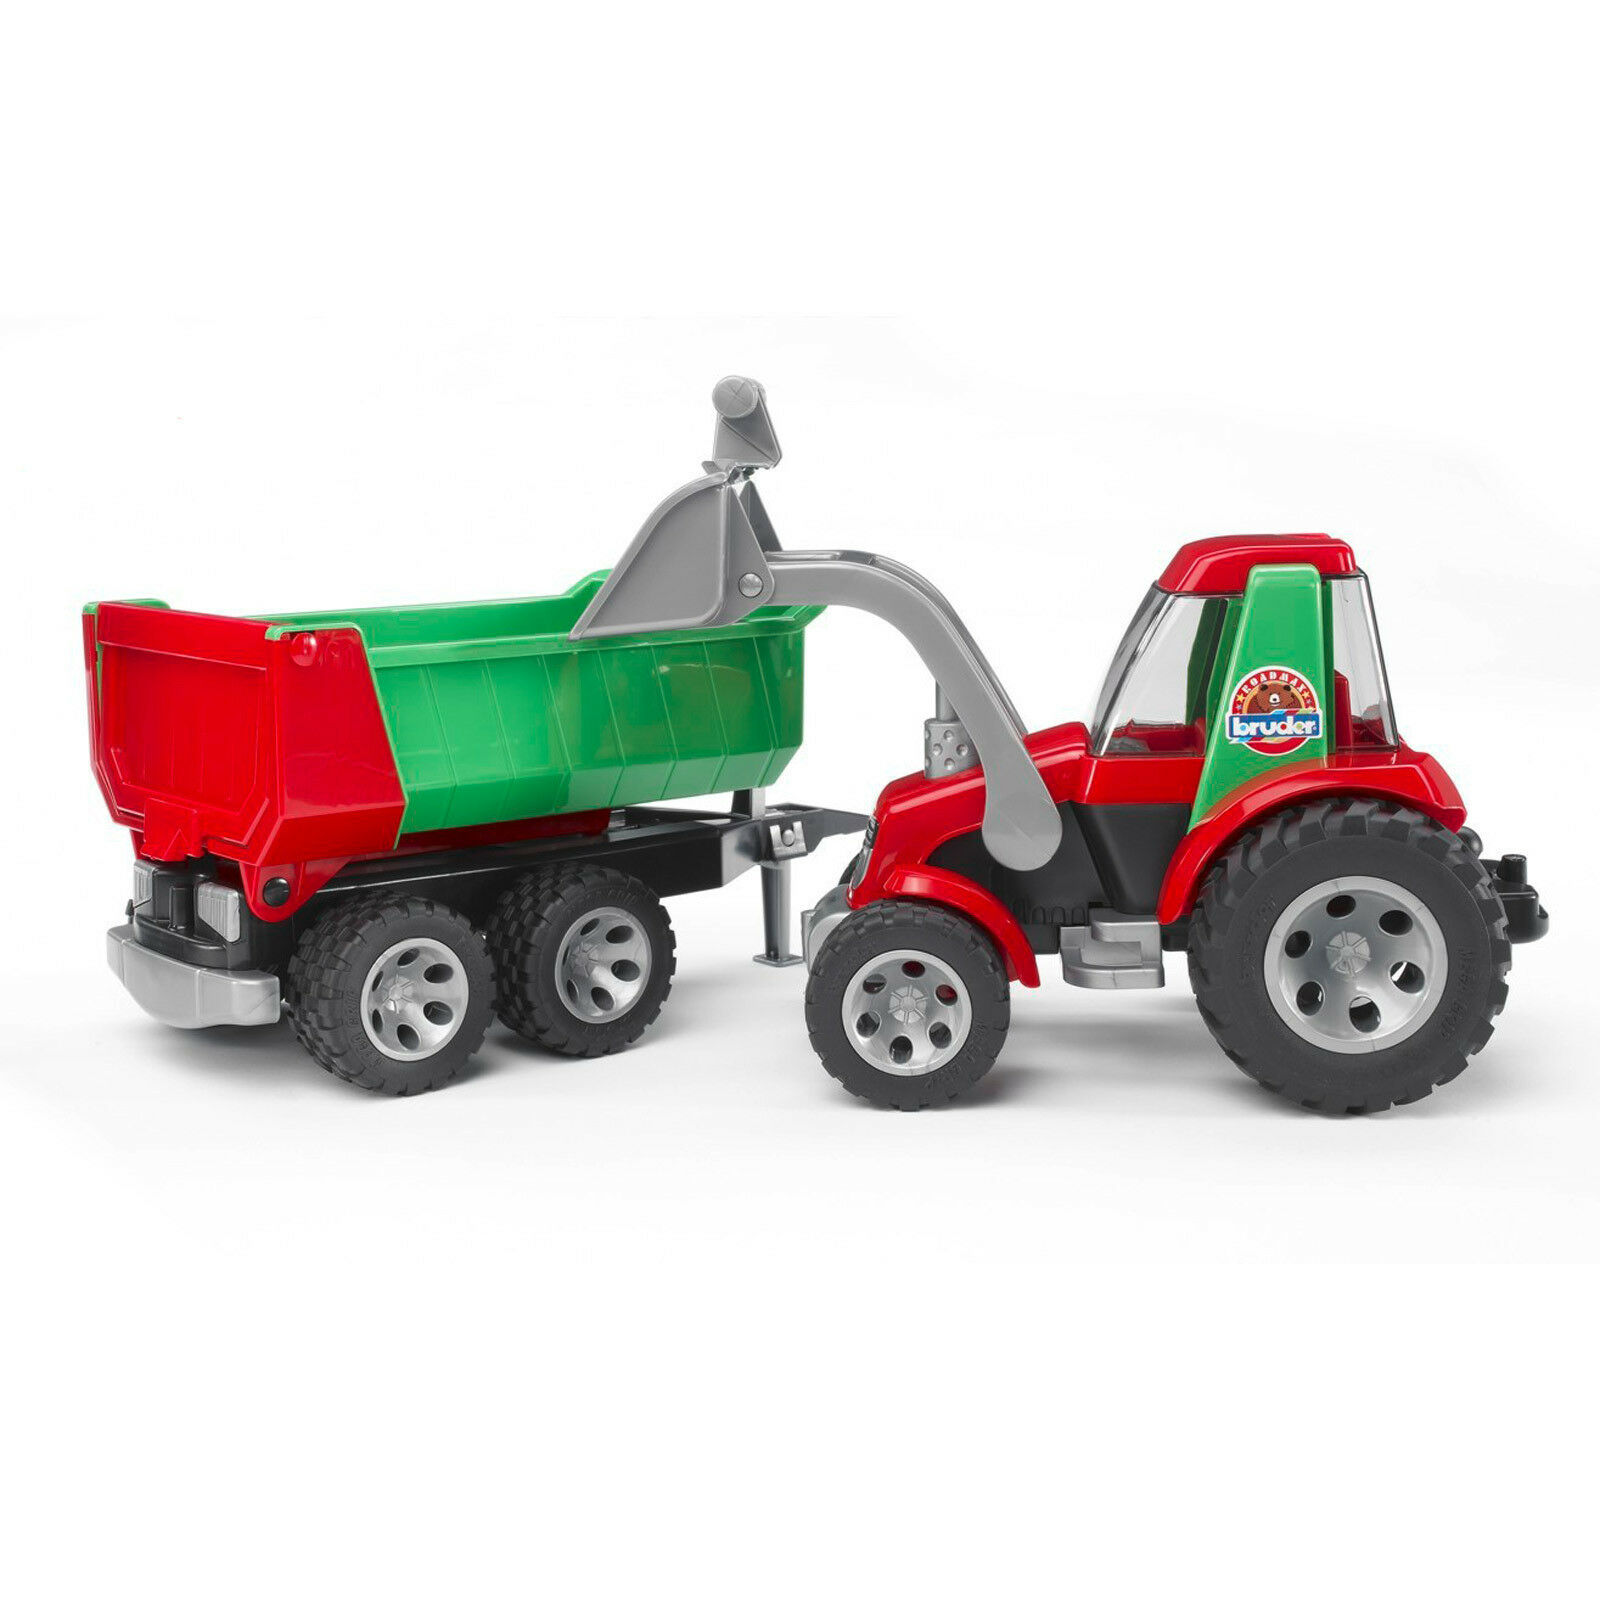 ROADMAX Kinder Spielzeug Traktor Kippanhänger mit Frontlader und Kippanhänger Traktor Anhänger 4ecb4e